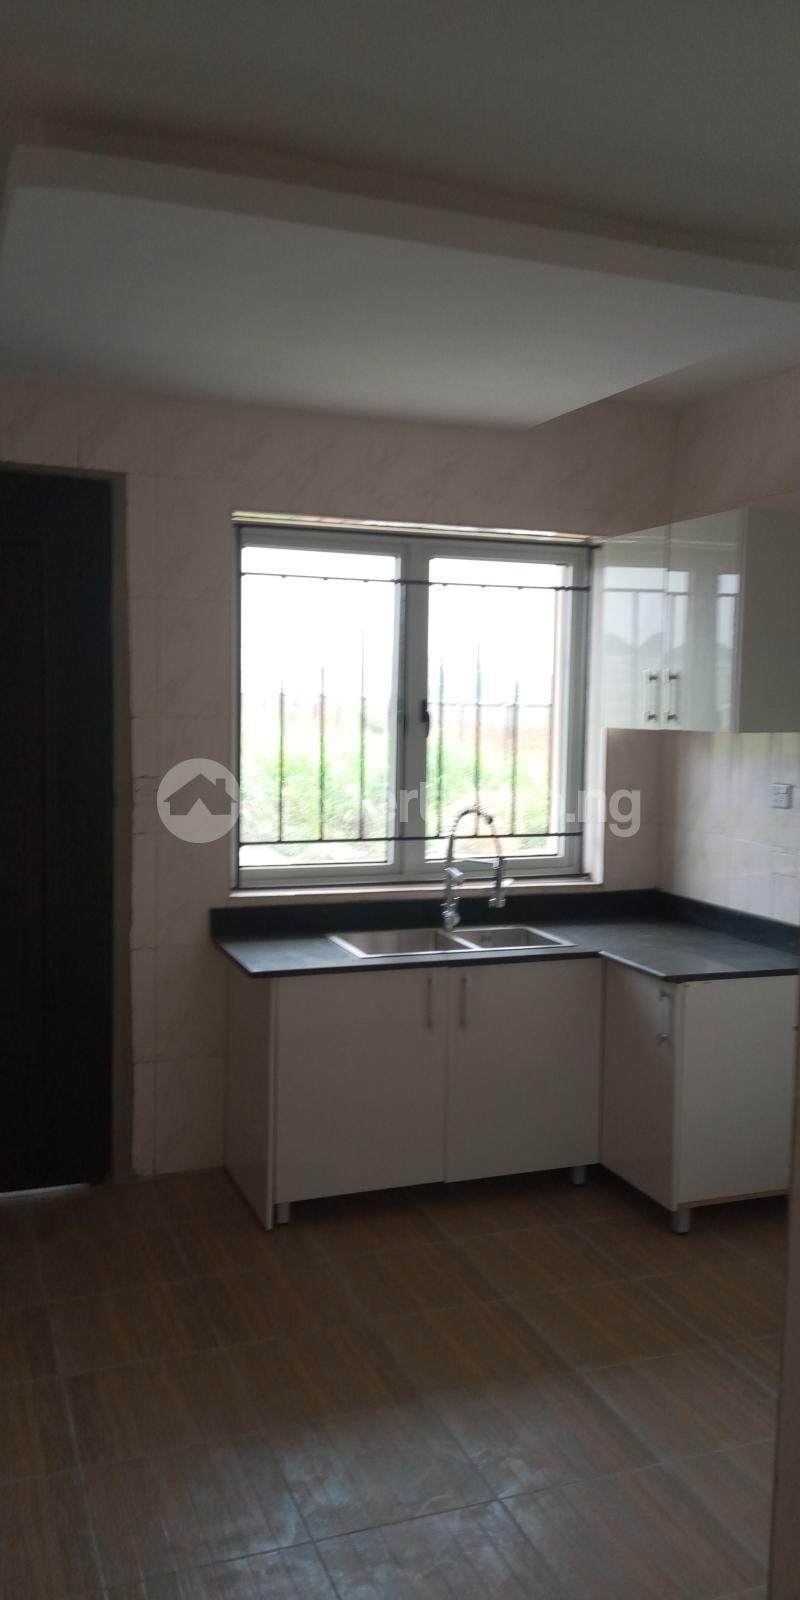 5 bedroom Detached Duplex House for rent Peace Gardens Estate Monastery road Sangotedo Lagos - 2